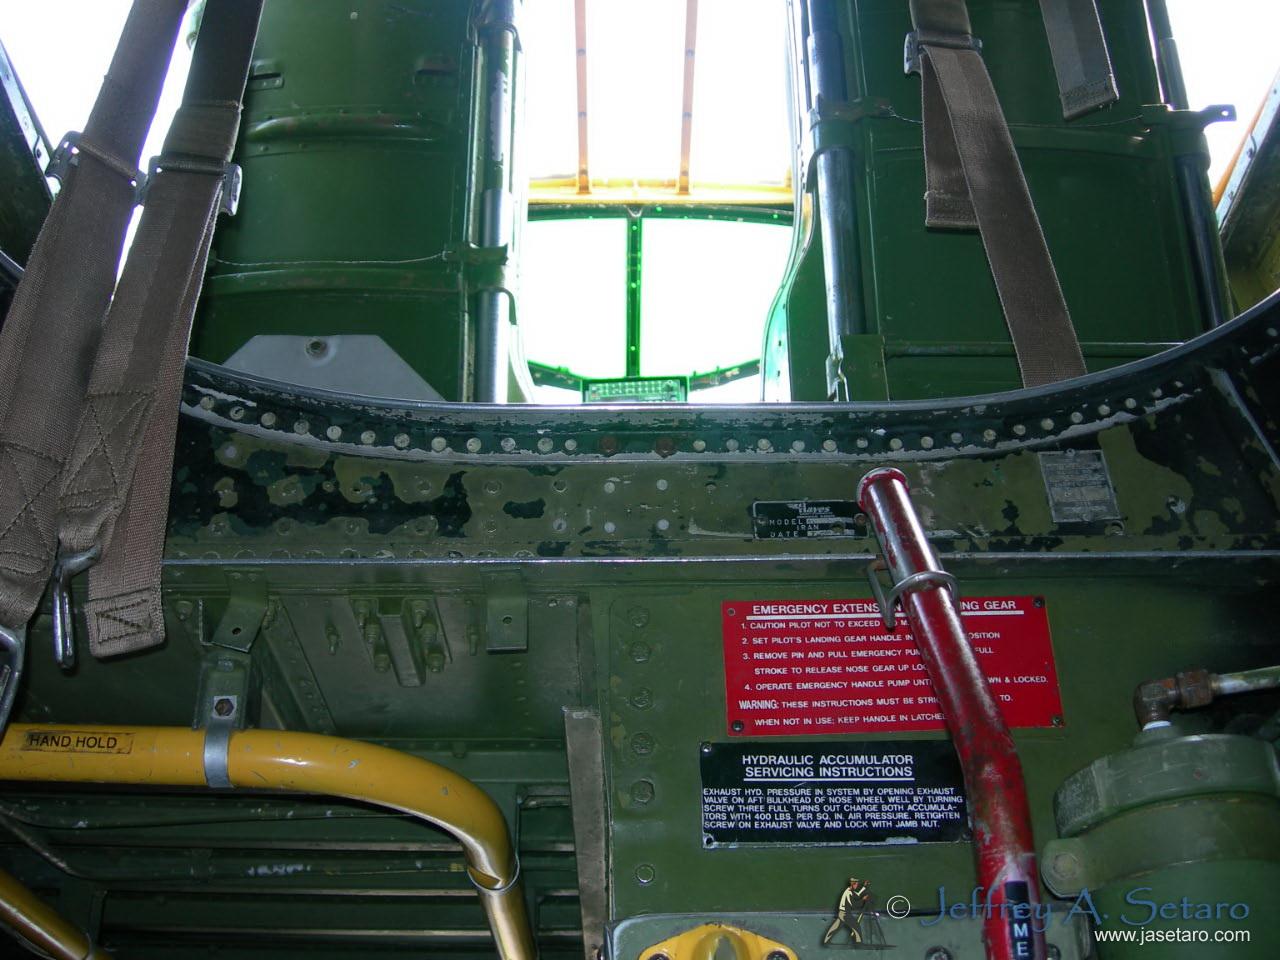 Tondelayo interior: facing forward looking up towards the flight deck